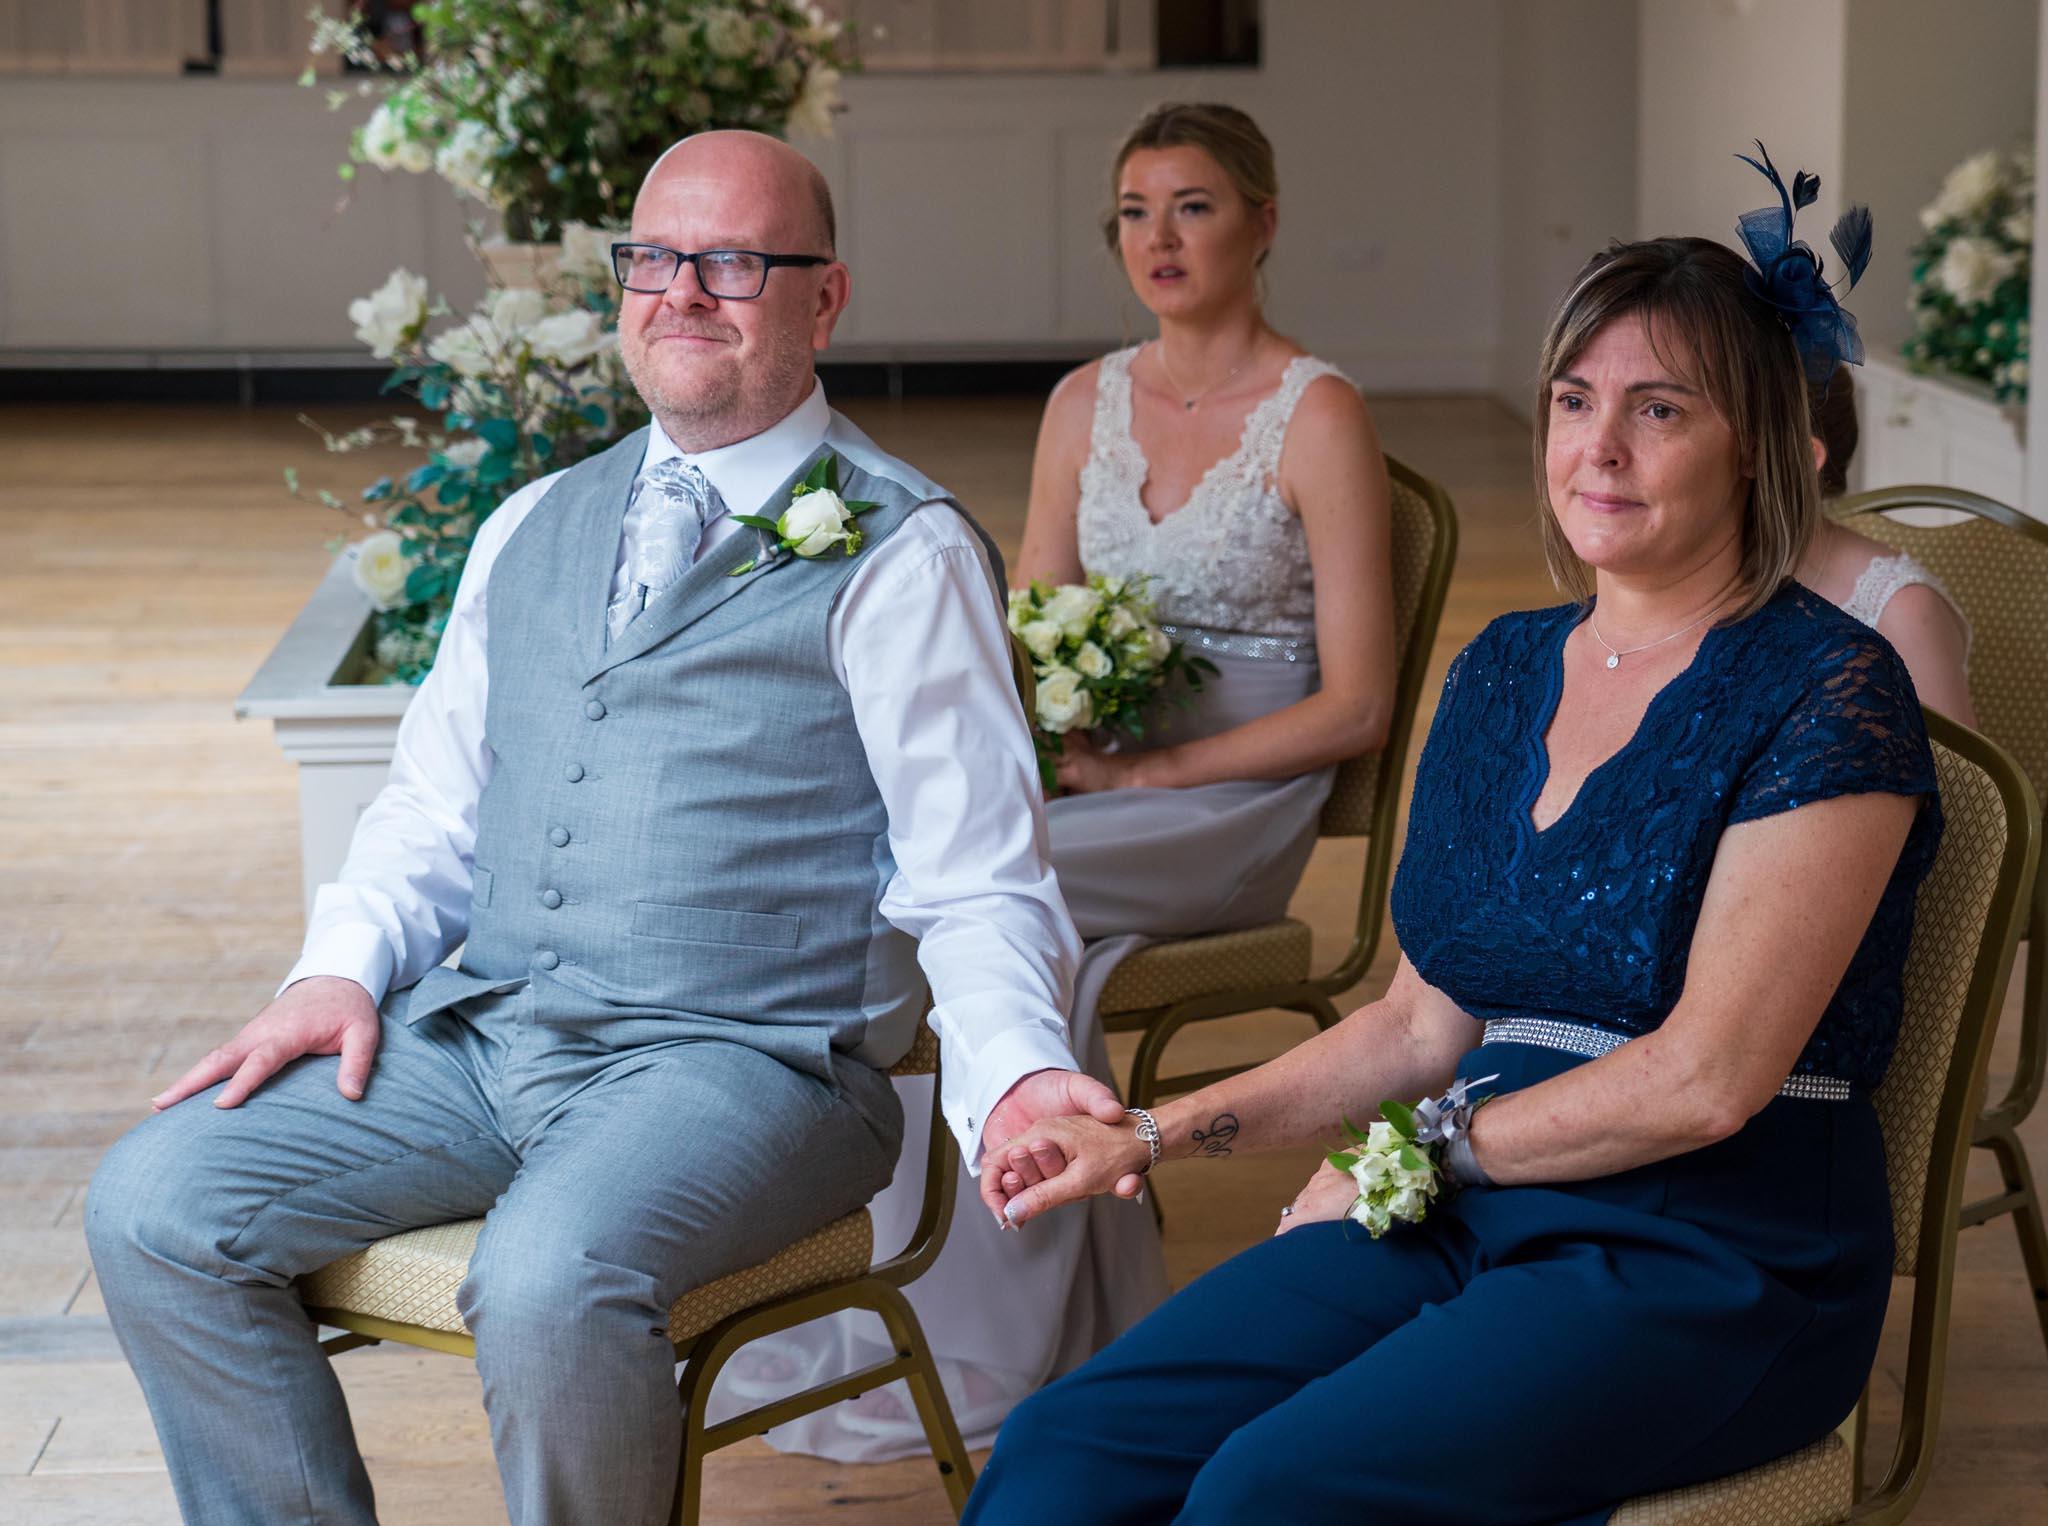 298-Ceremony-Luke-Yasmin-The-Rayleigh-Club-Wedding-Photography.jpg